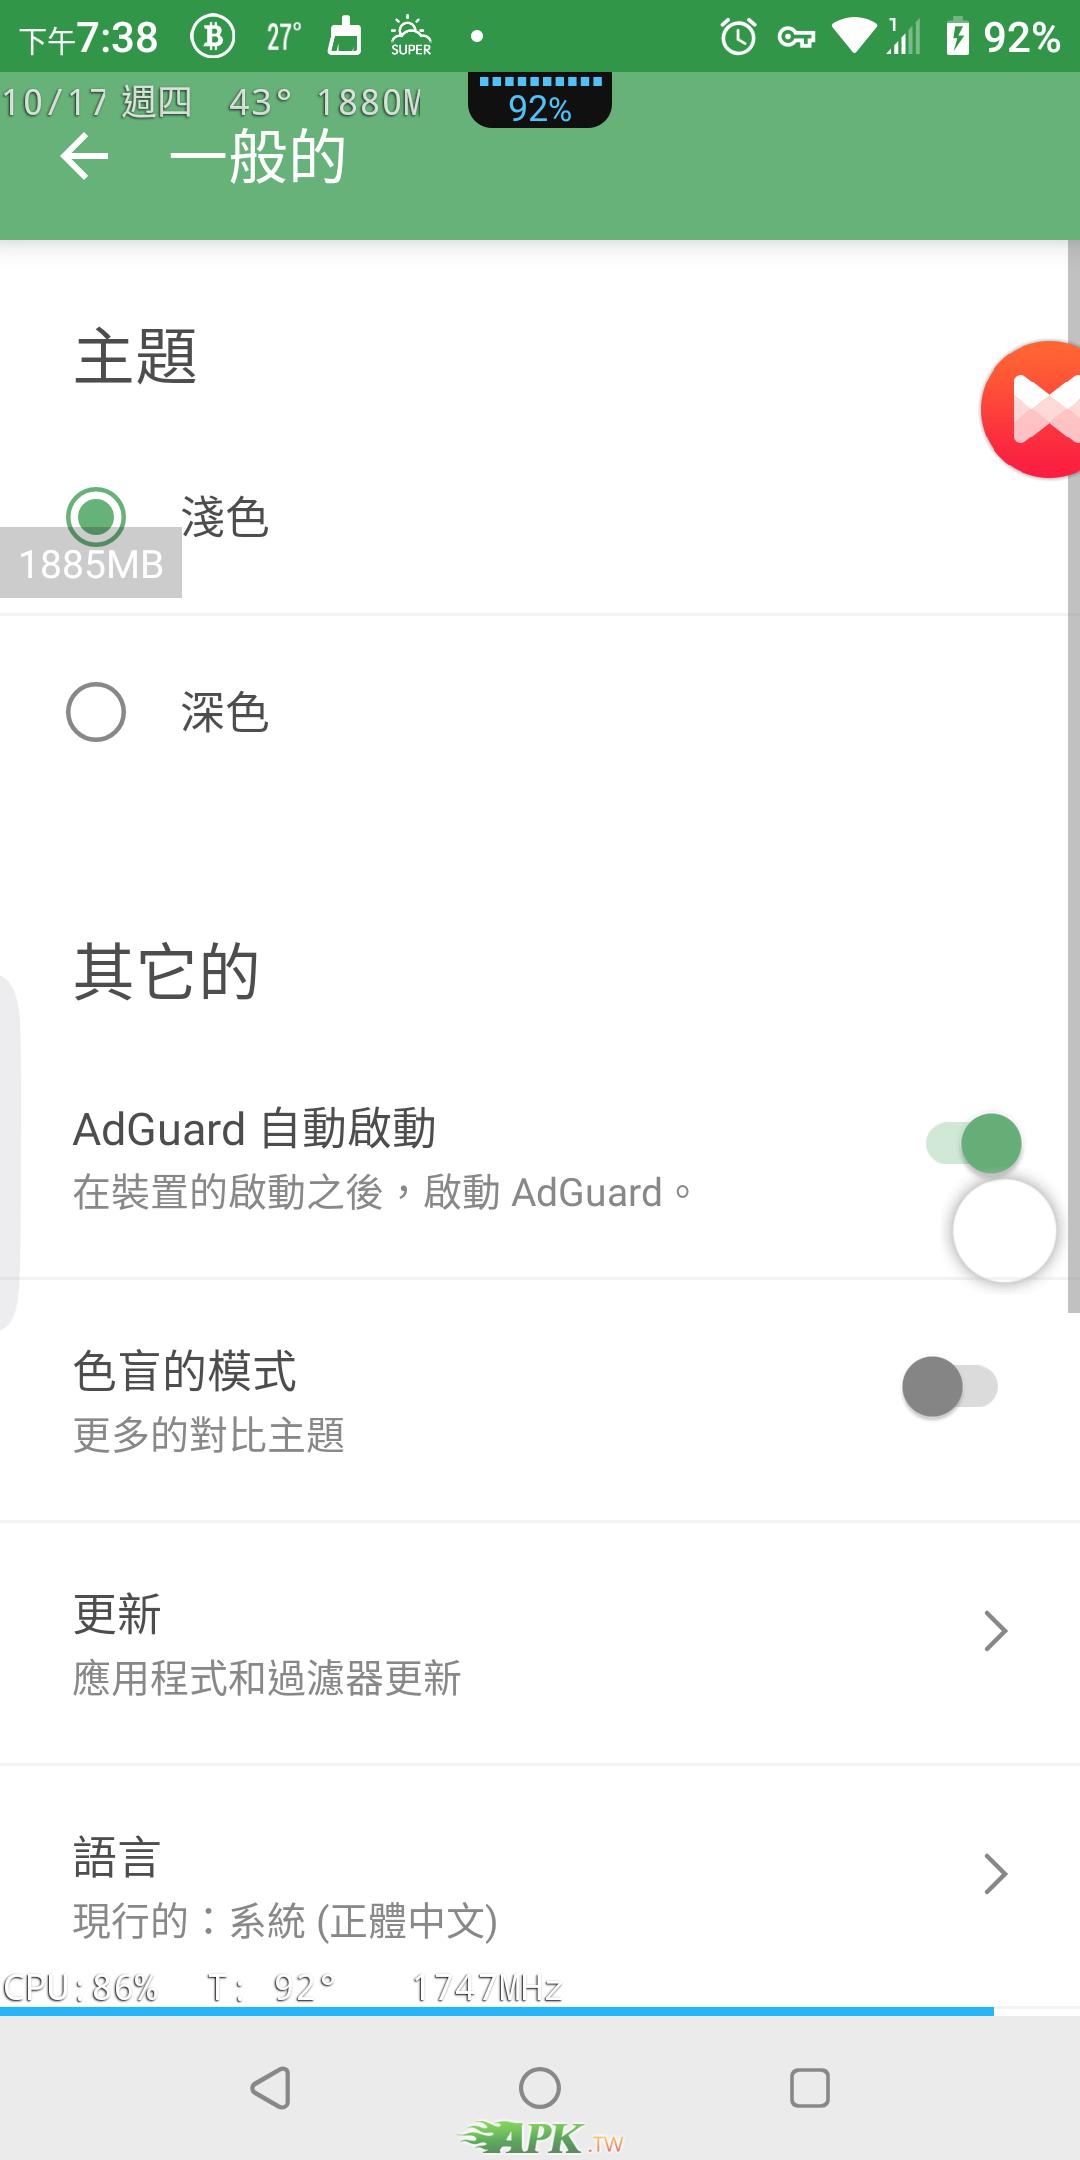 Screenshot_20191017-193858.png